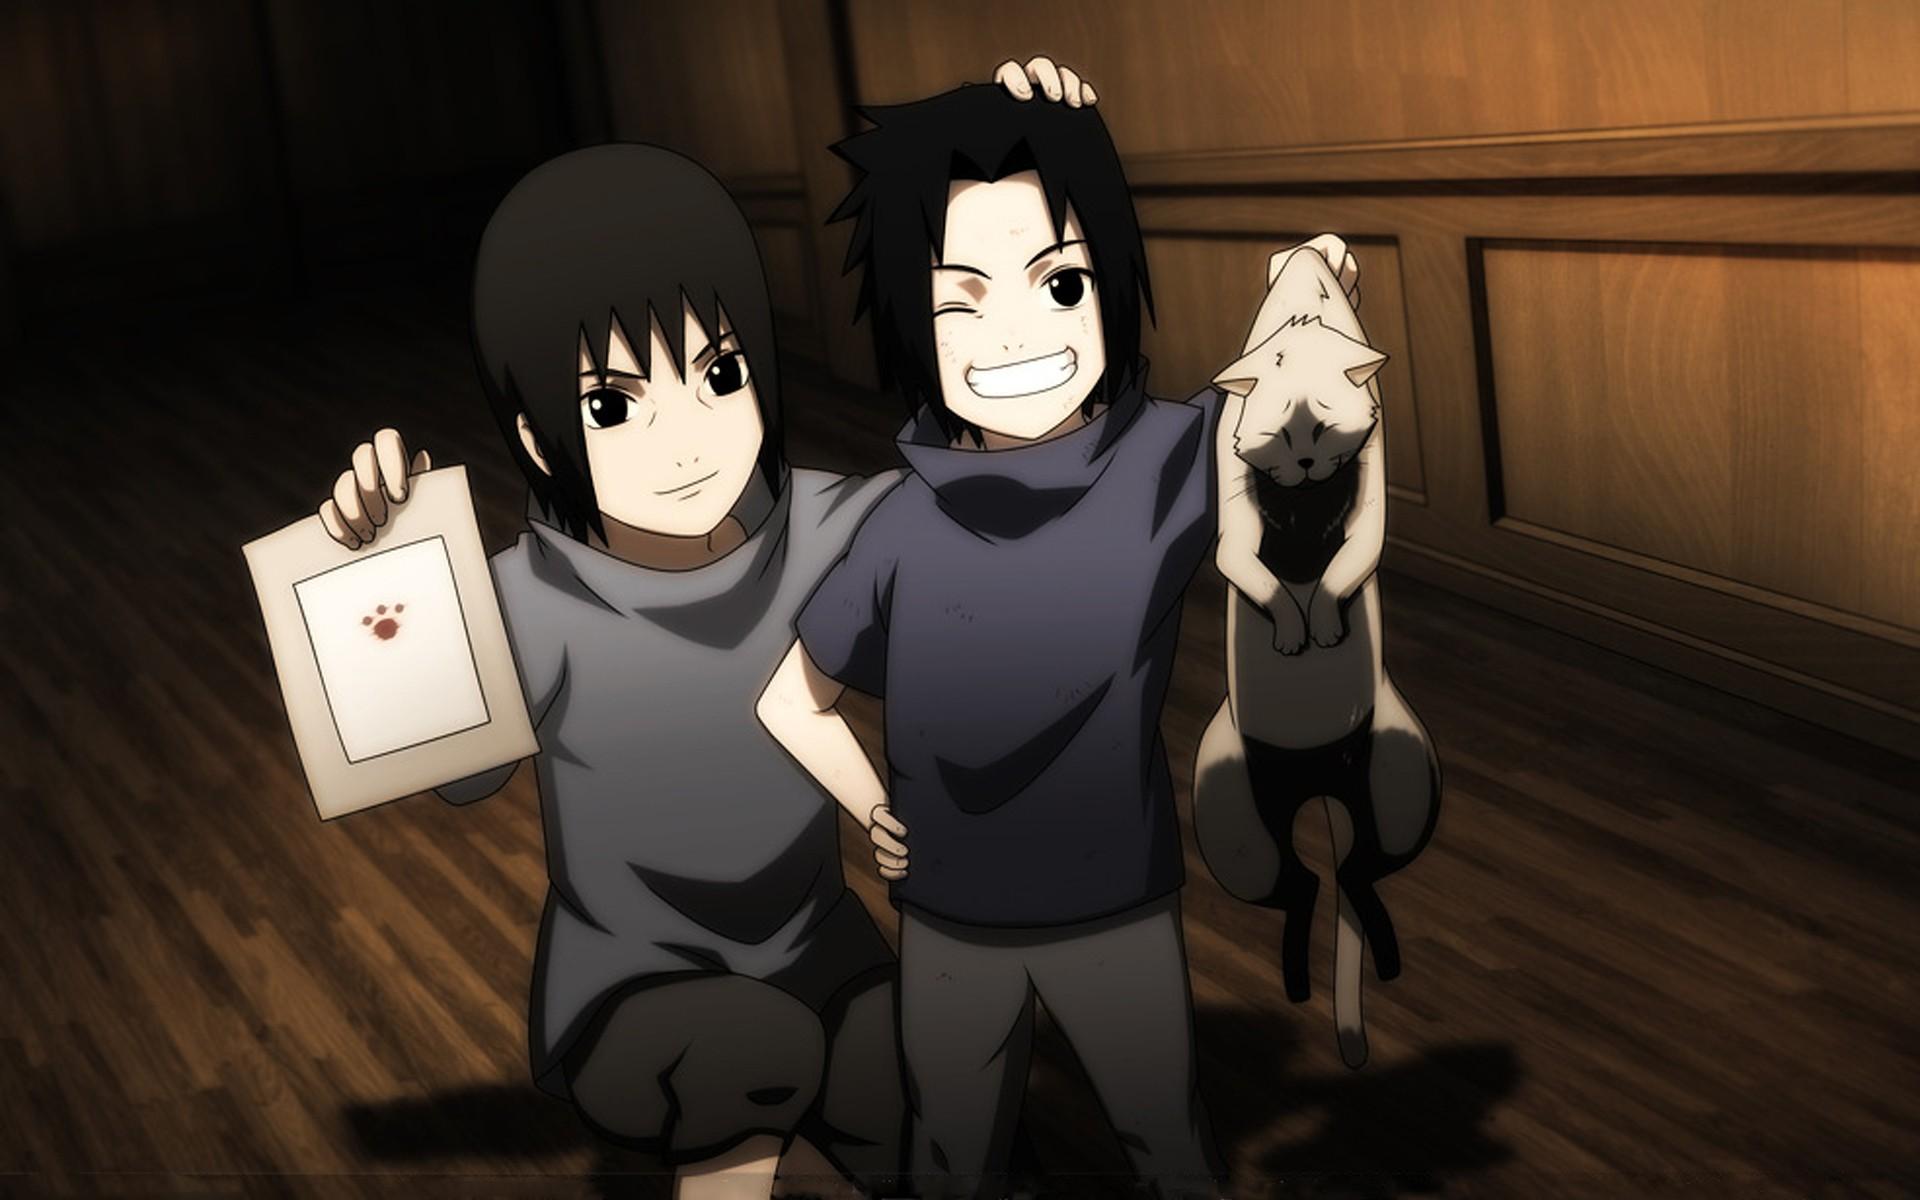 Anime Wallpaper Naruto Shippuden Cats Uchiha Sasuke Naruto Shippuden Uchiha Itachi Anime